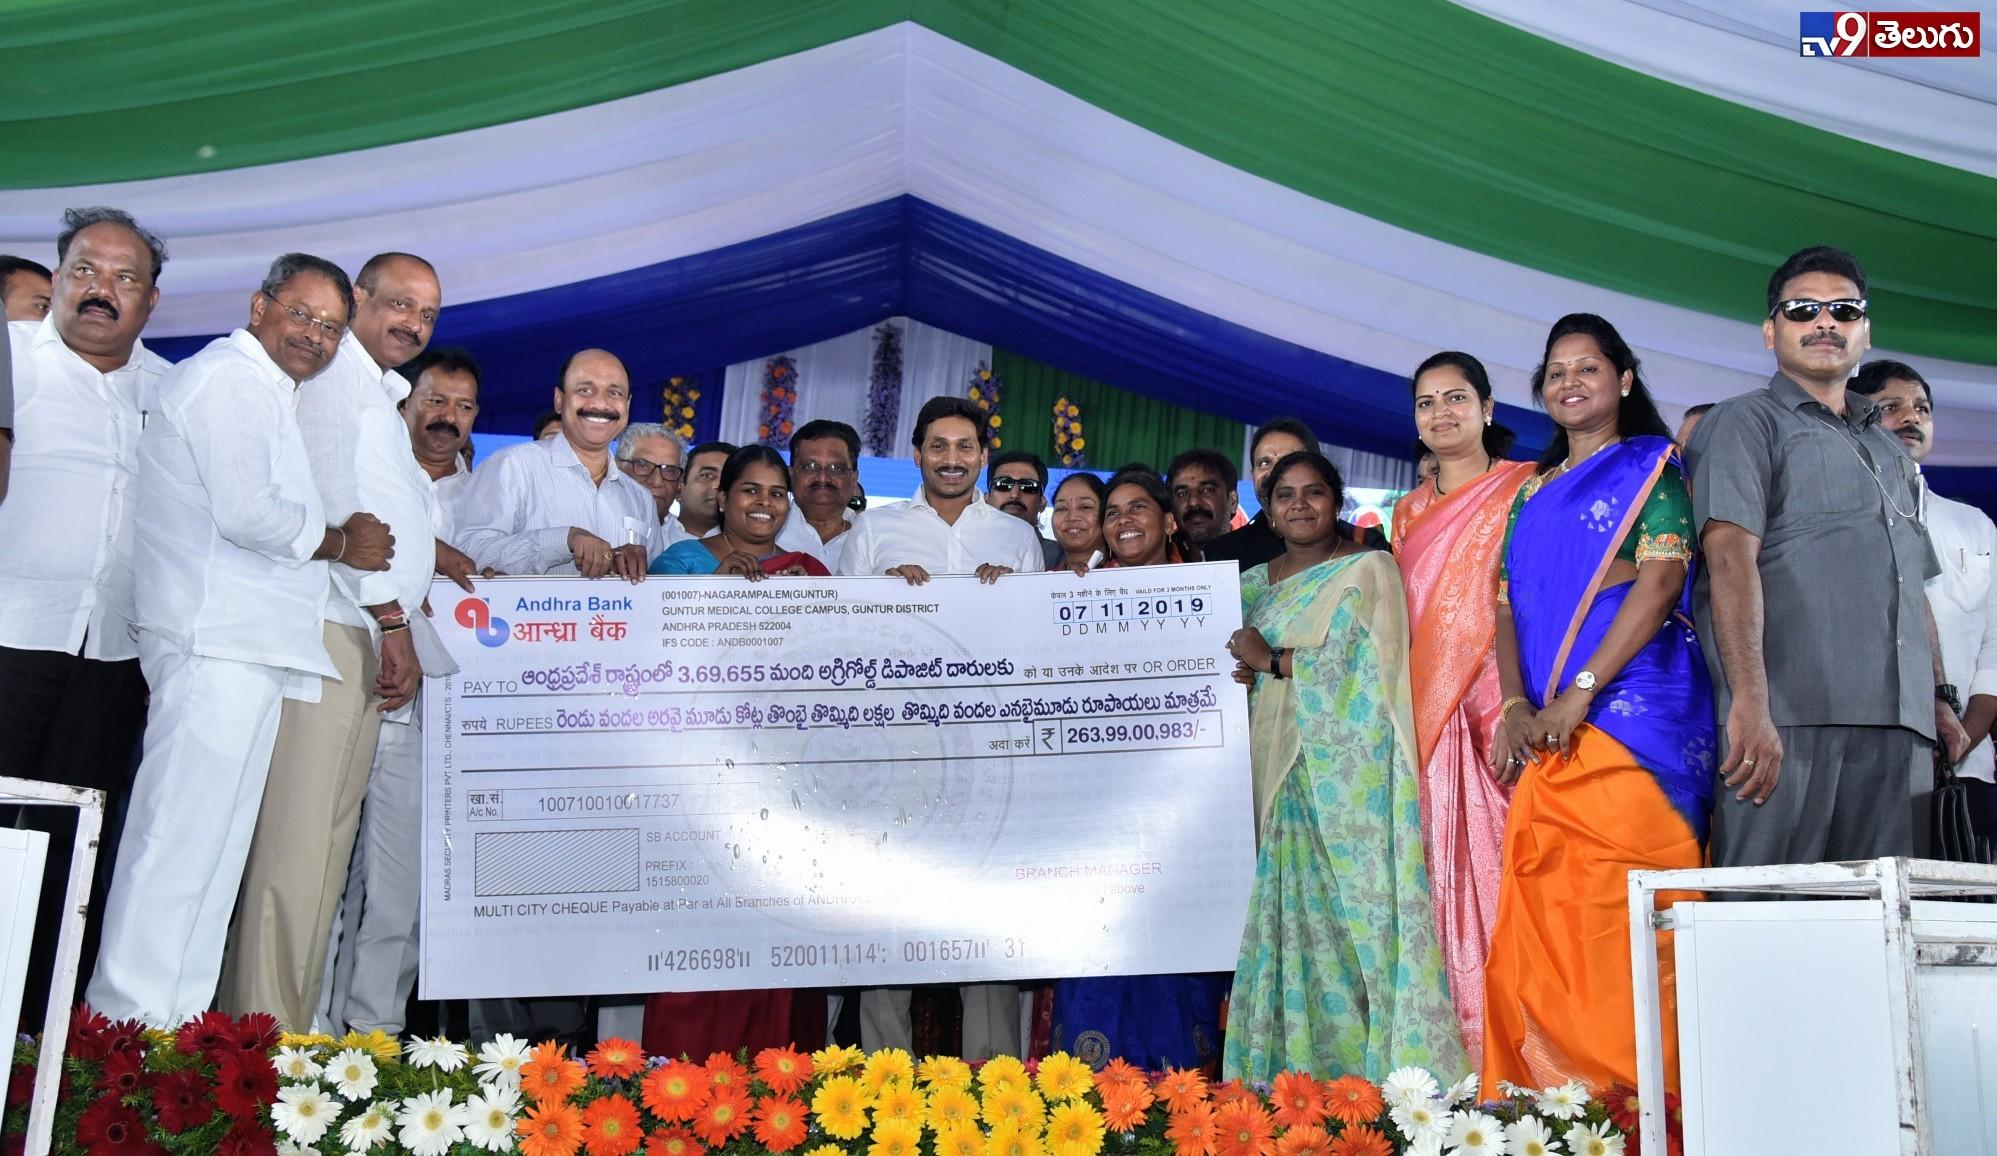 Agri Gold Victims Cheque Distribution in Guntur, గుంటూరులో అగ్రిగోల్డ్ బాధితులకు చెక్కులు పంపిణీ చేస్తున్న  సీఎం వైయస్ జగన్